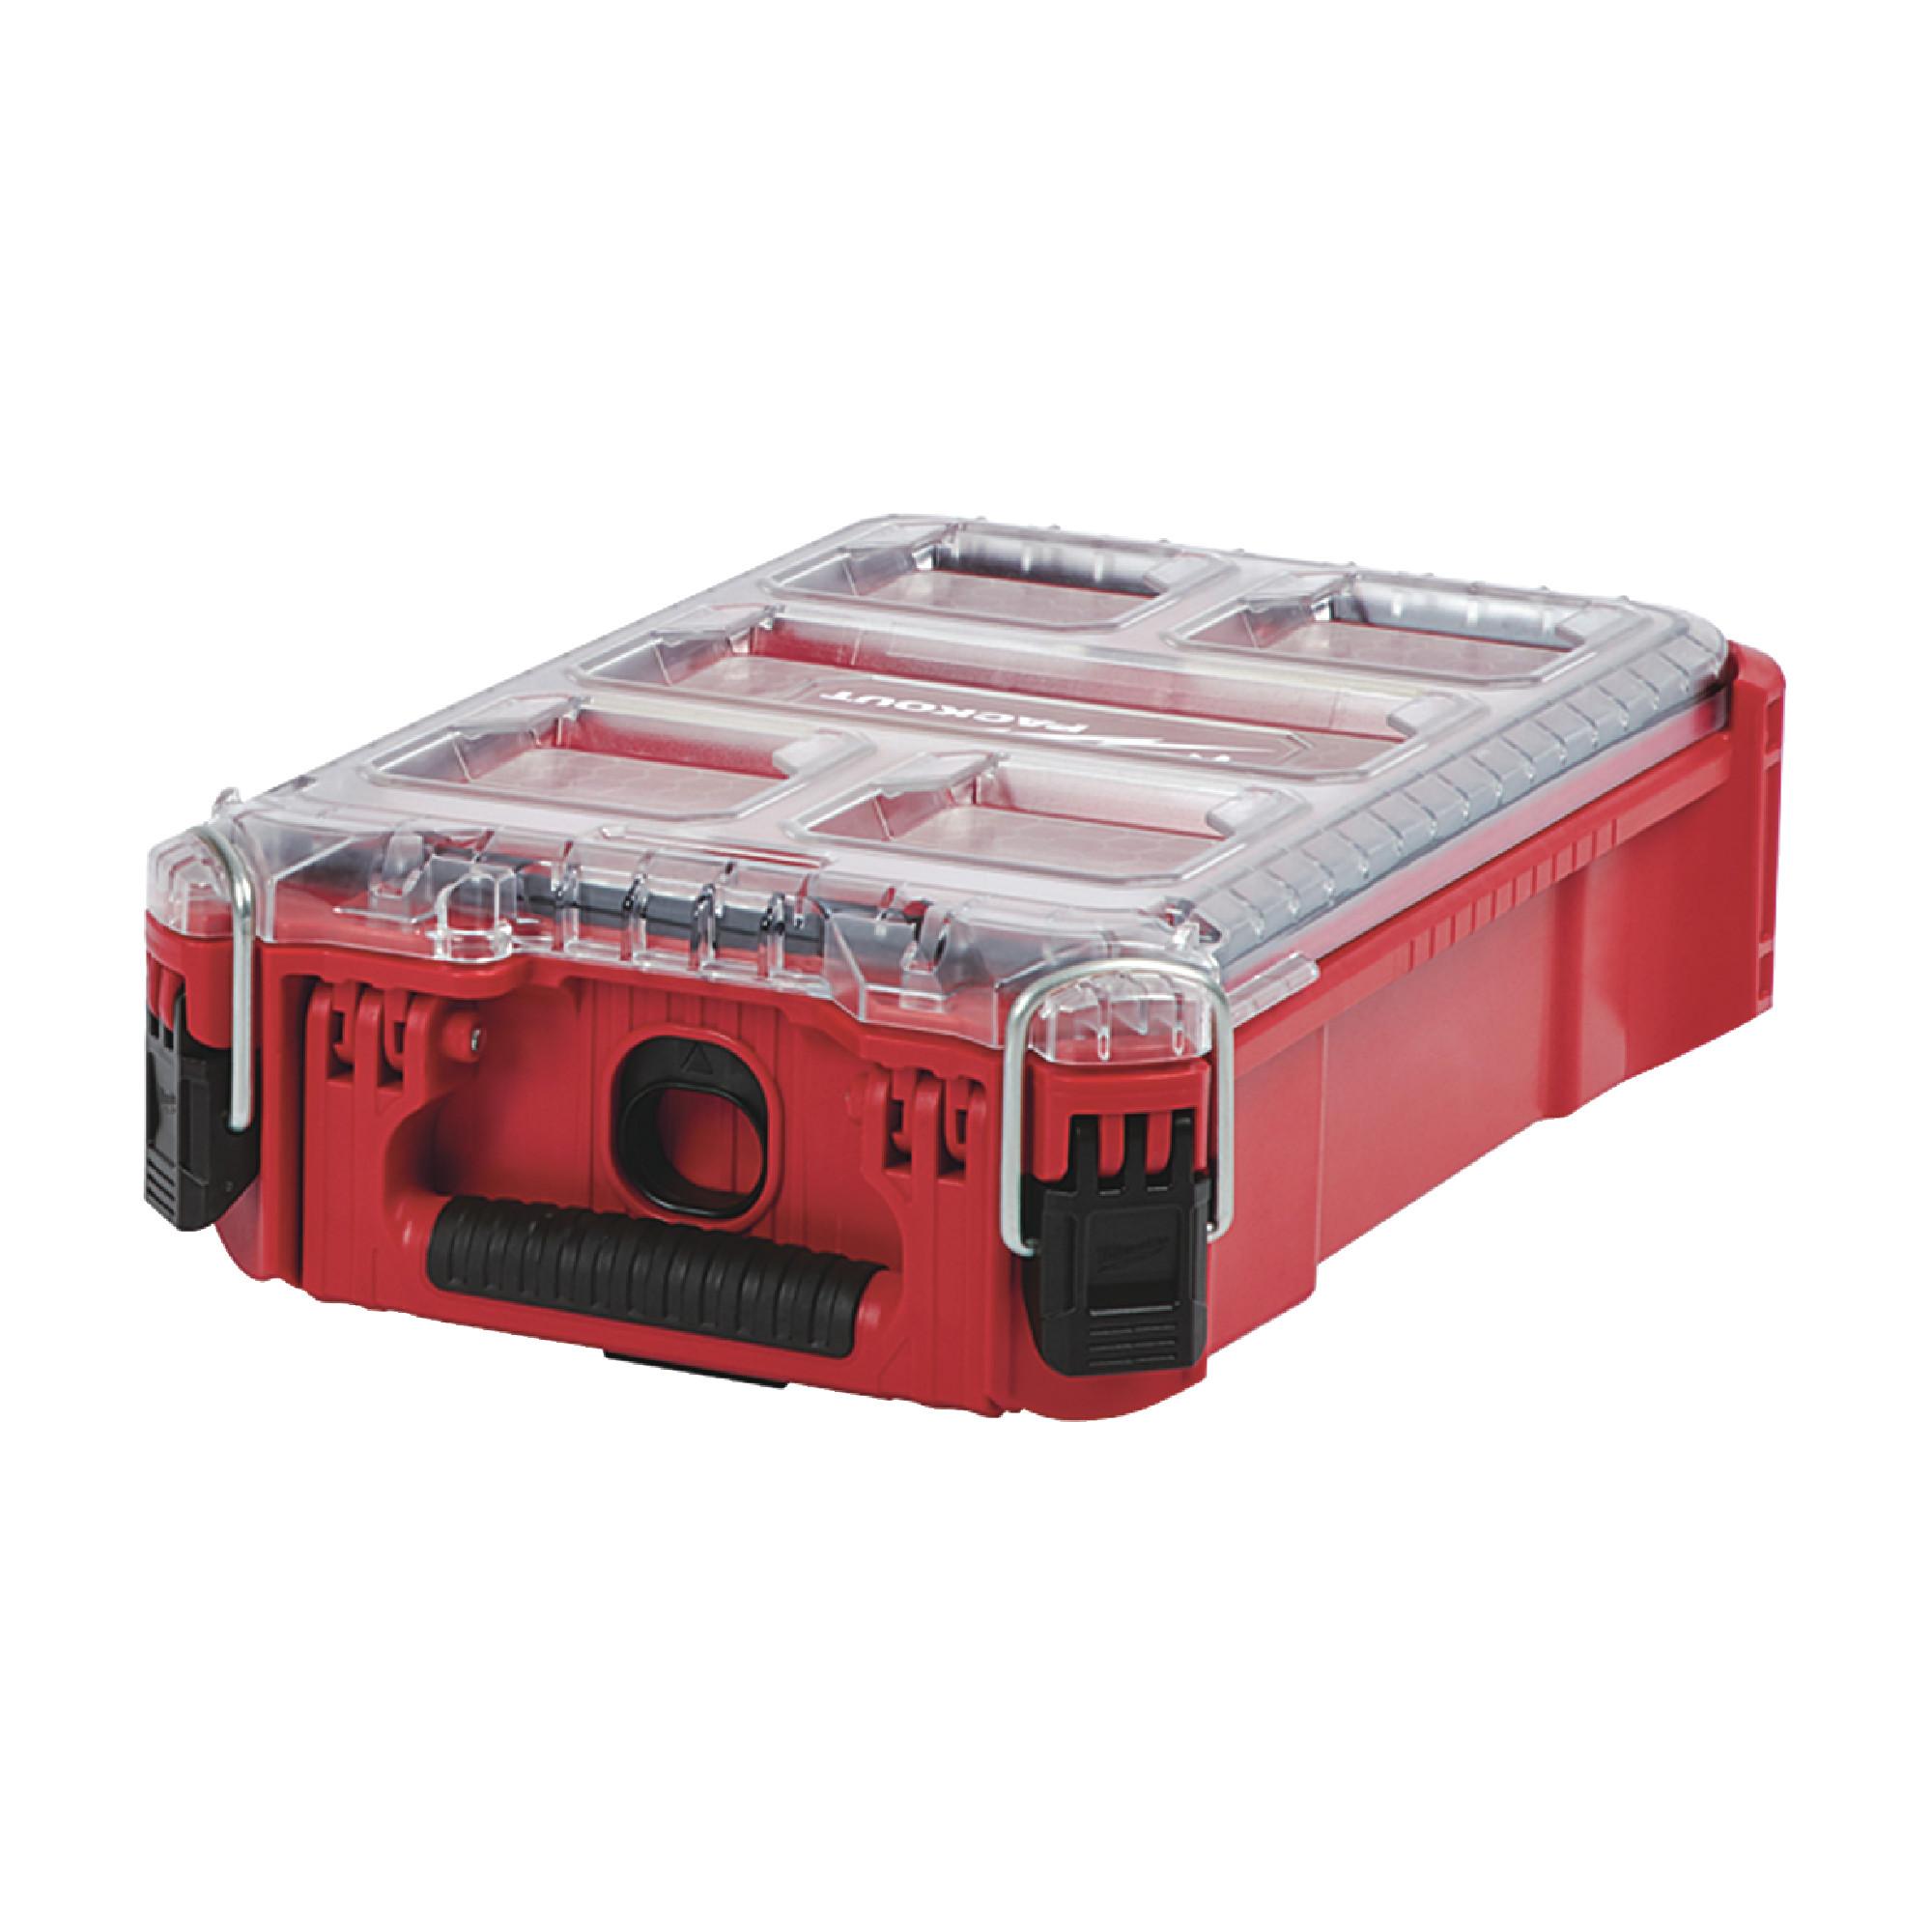 MILWAUKEE PACKOUT Compact Organizer